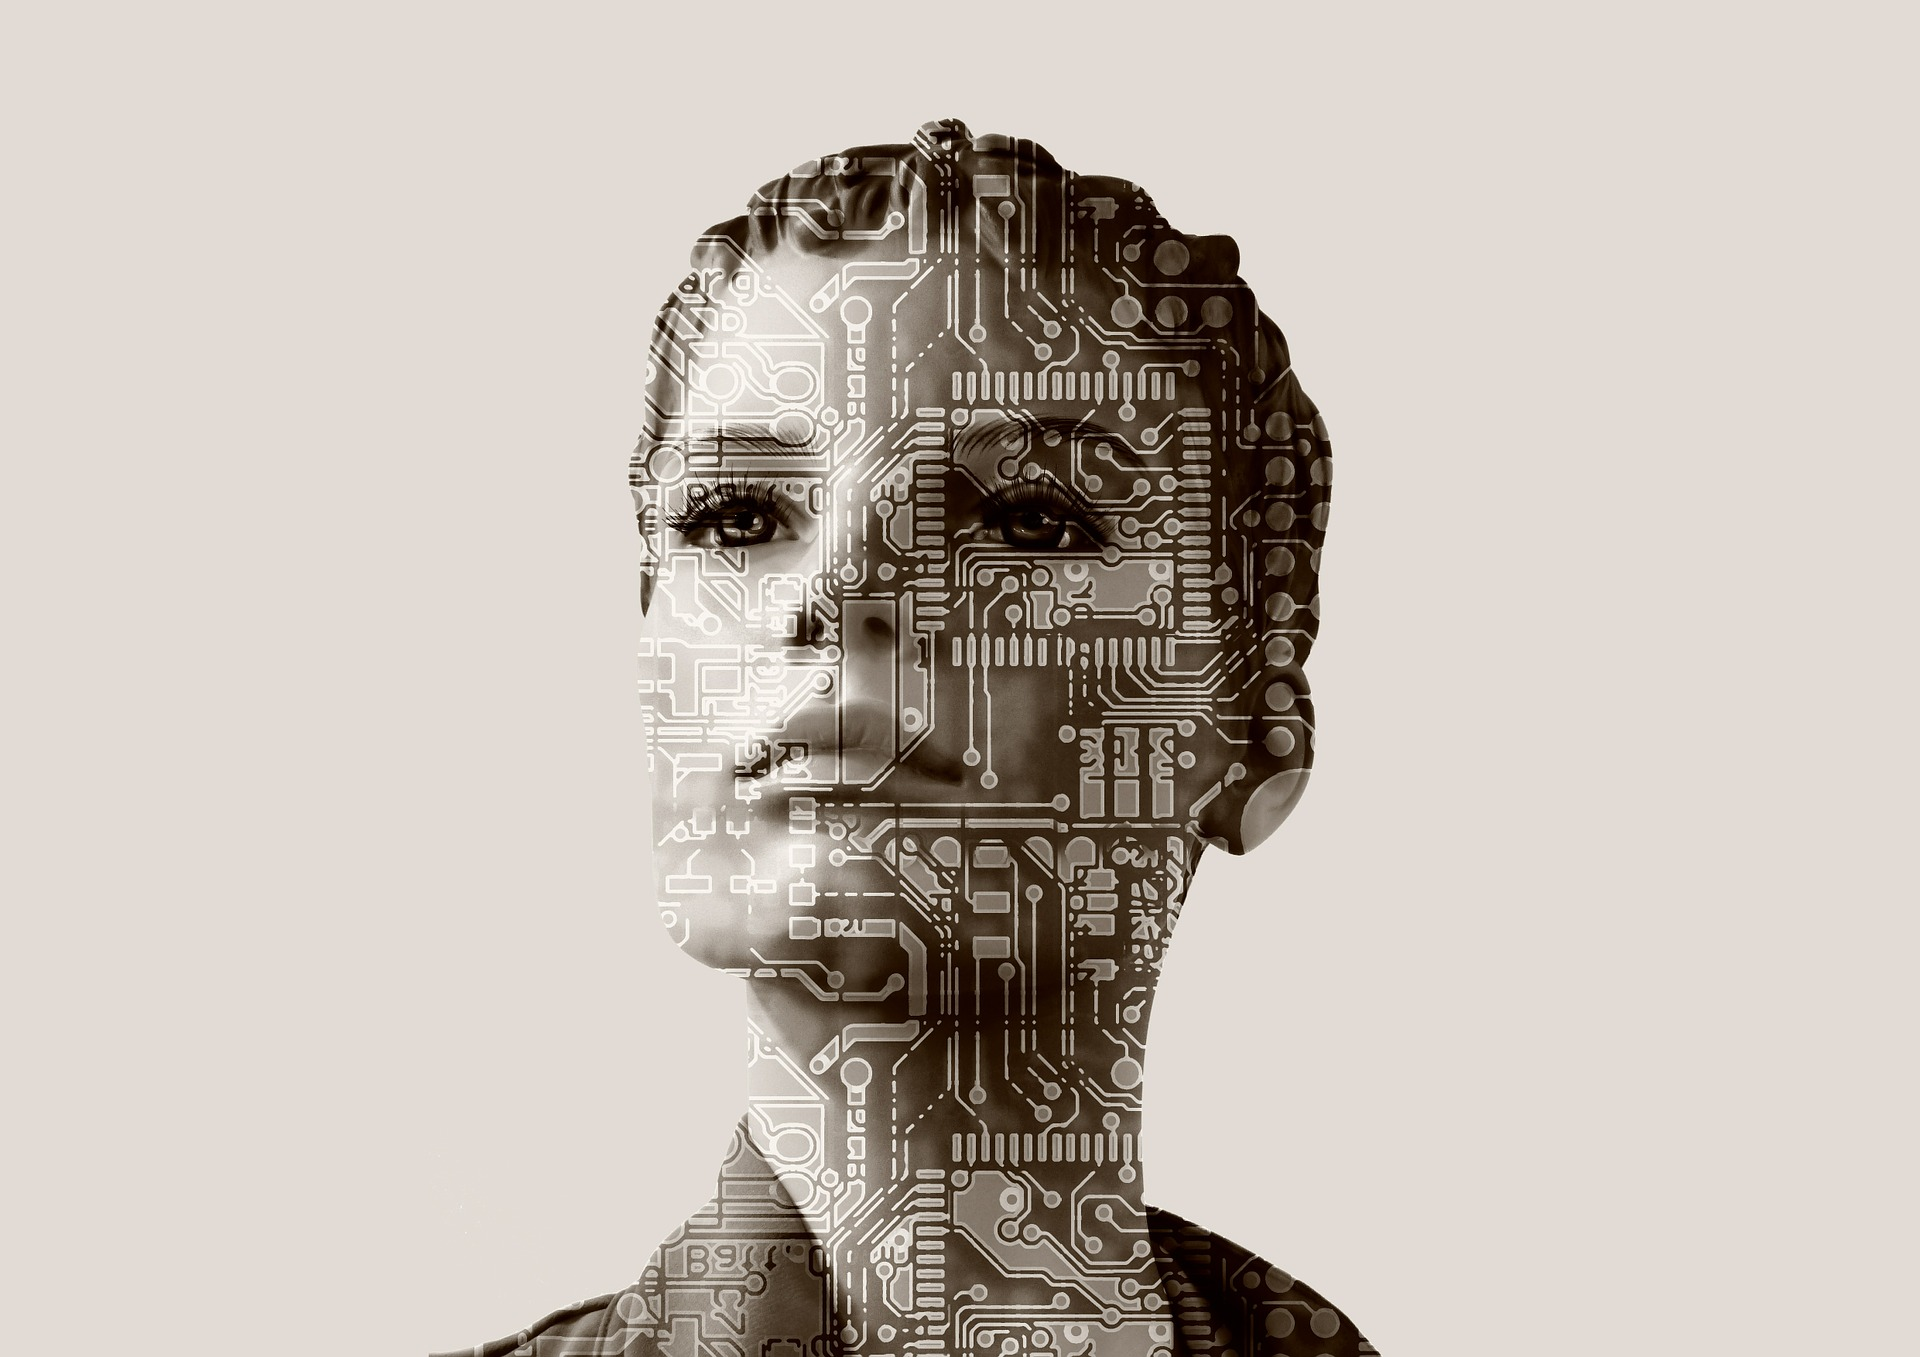 Donne in informatica